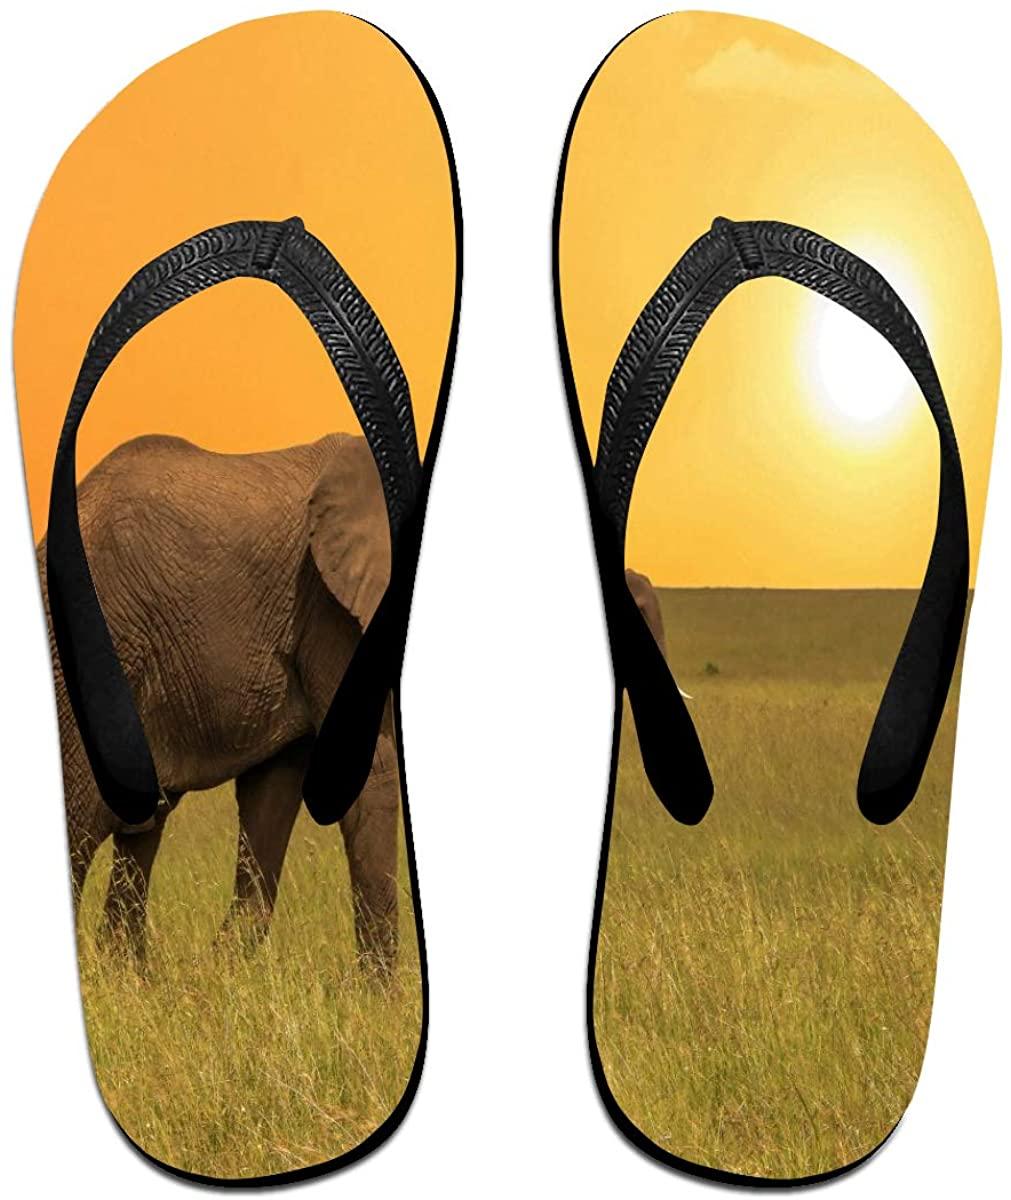 Mens Flip Flop Slippers African Animal Elephants in Savanah Sunset Rubber Comfy Flip Flops Outdoor Beach Sandals